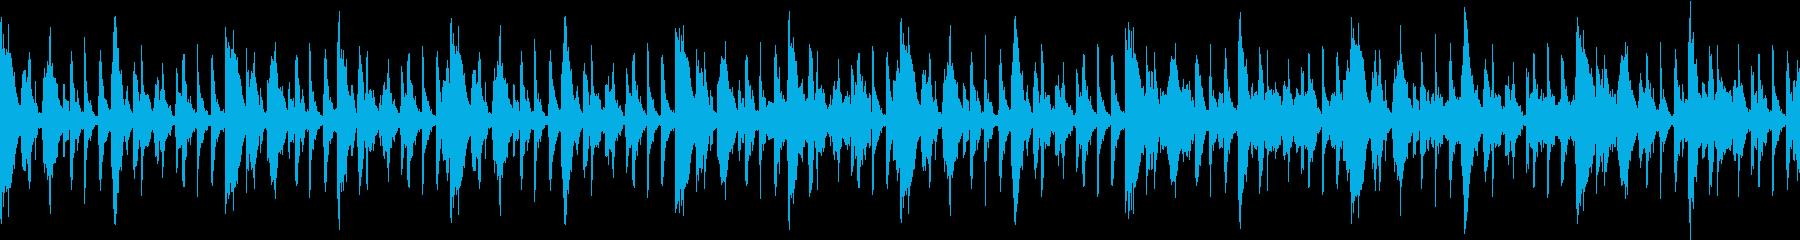 SAXの入ったラテンポップの再生済みの波形